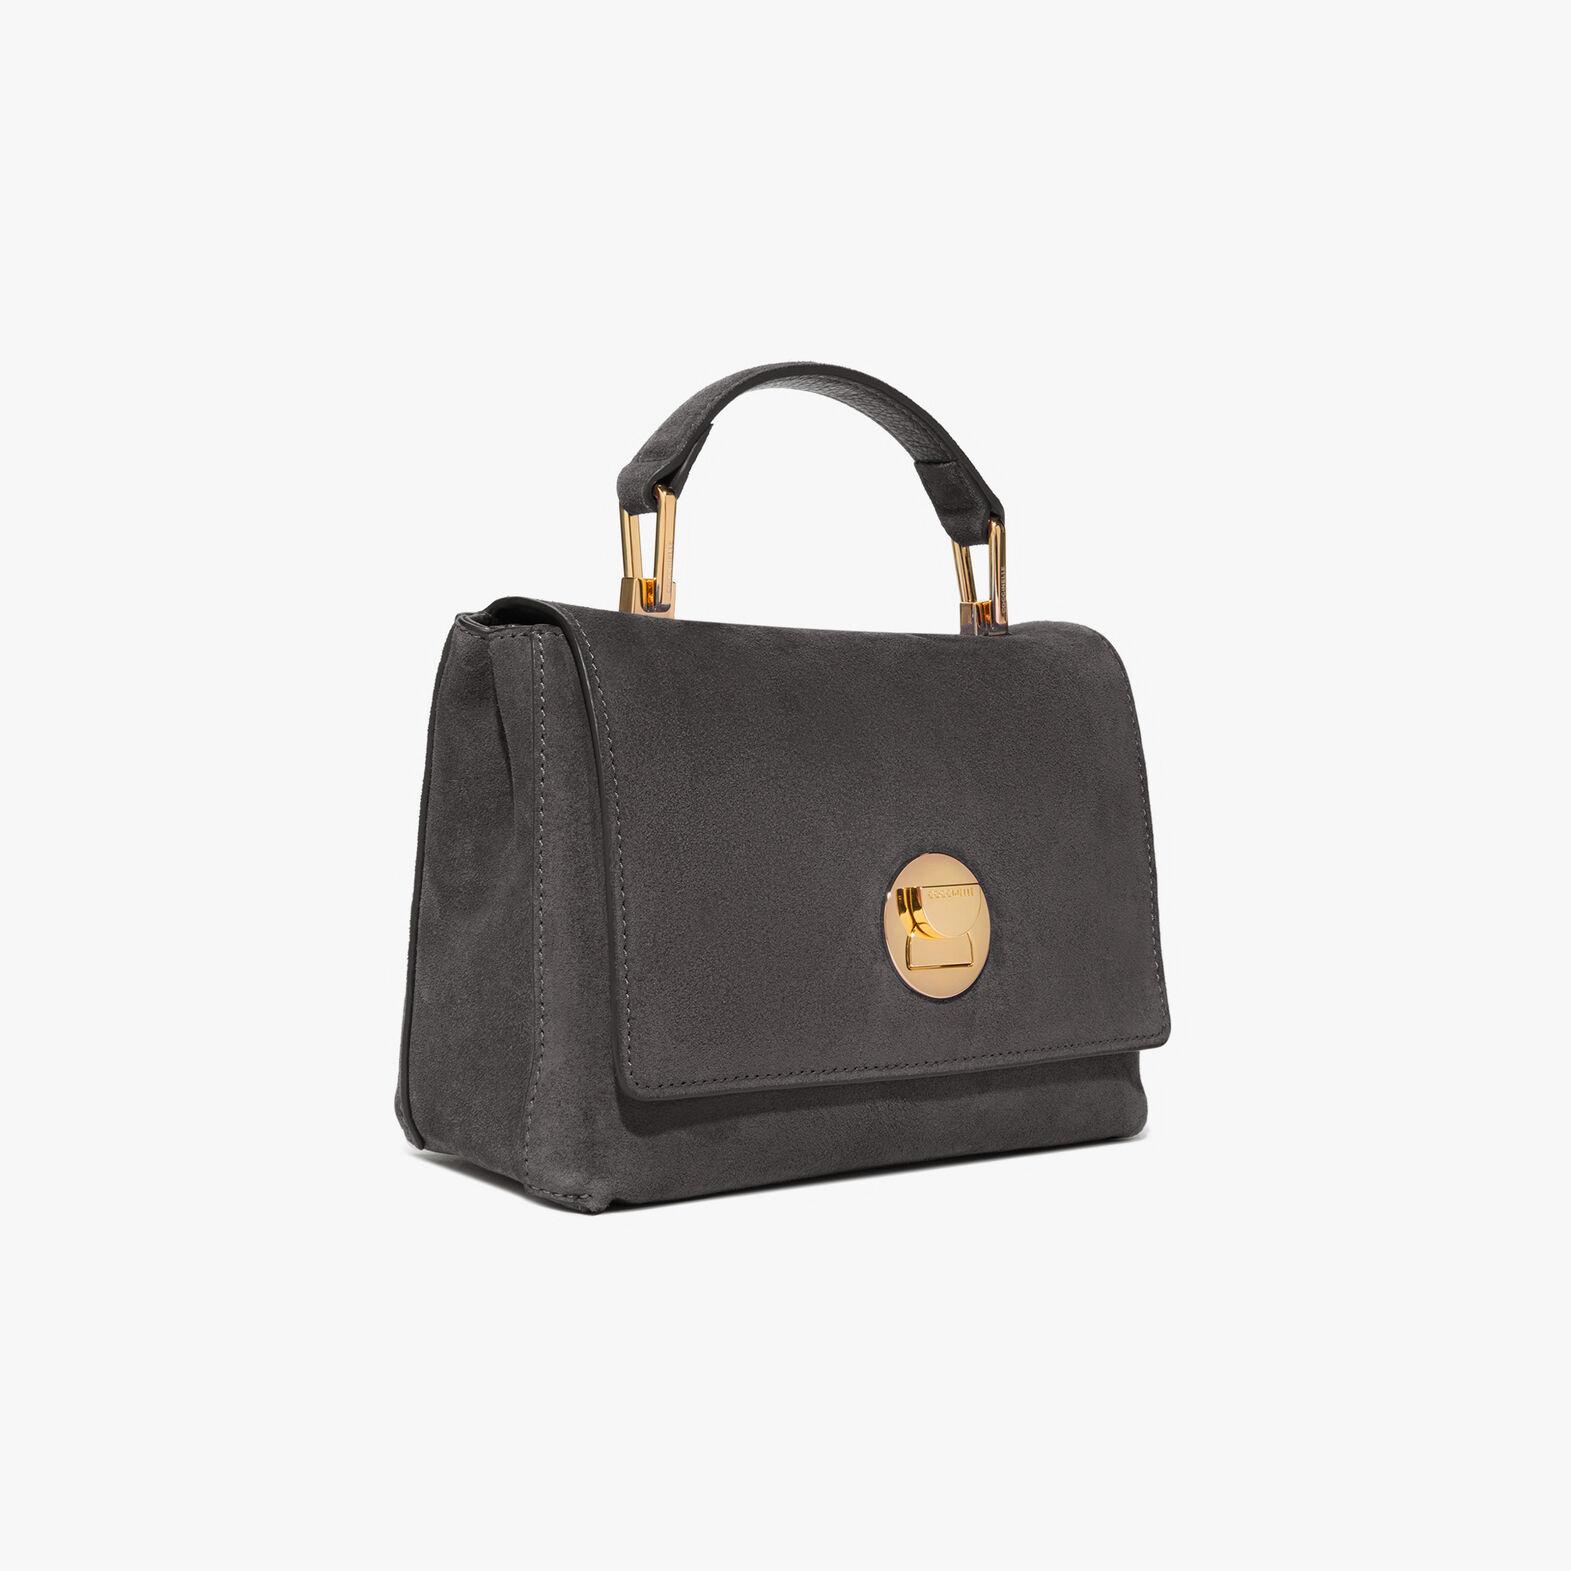 Coccinelle Liya suede mini handbag